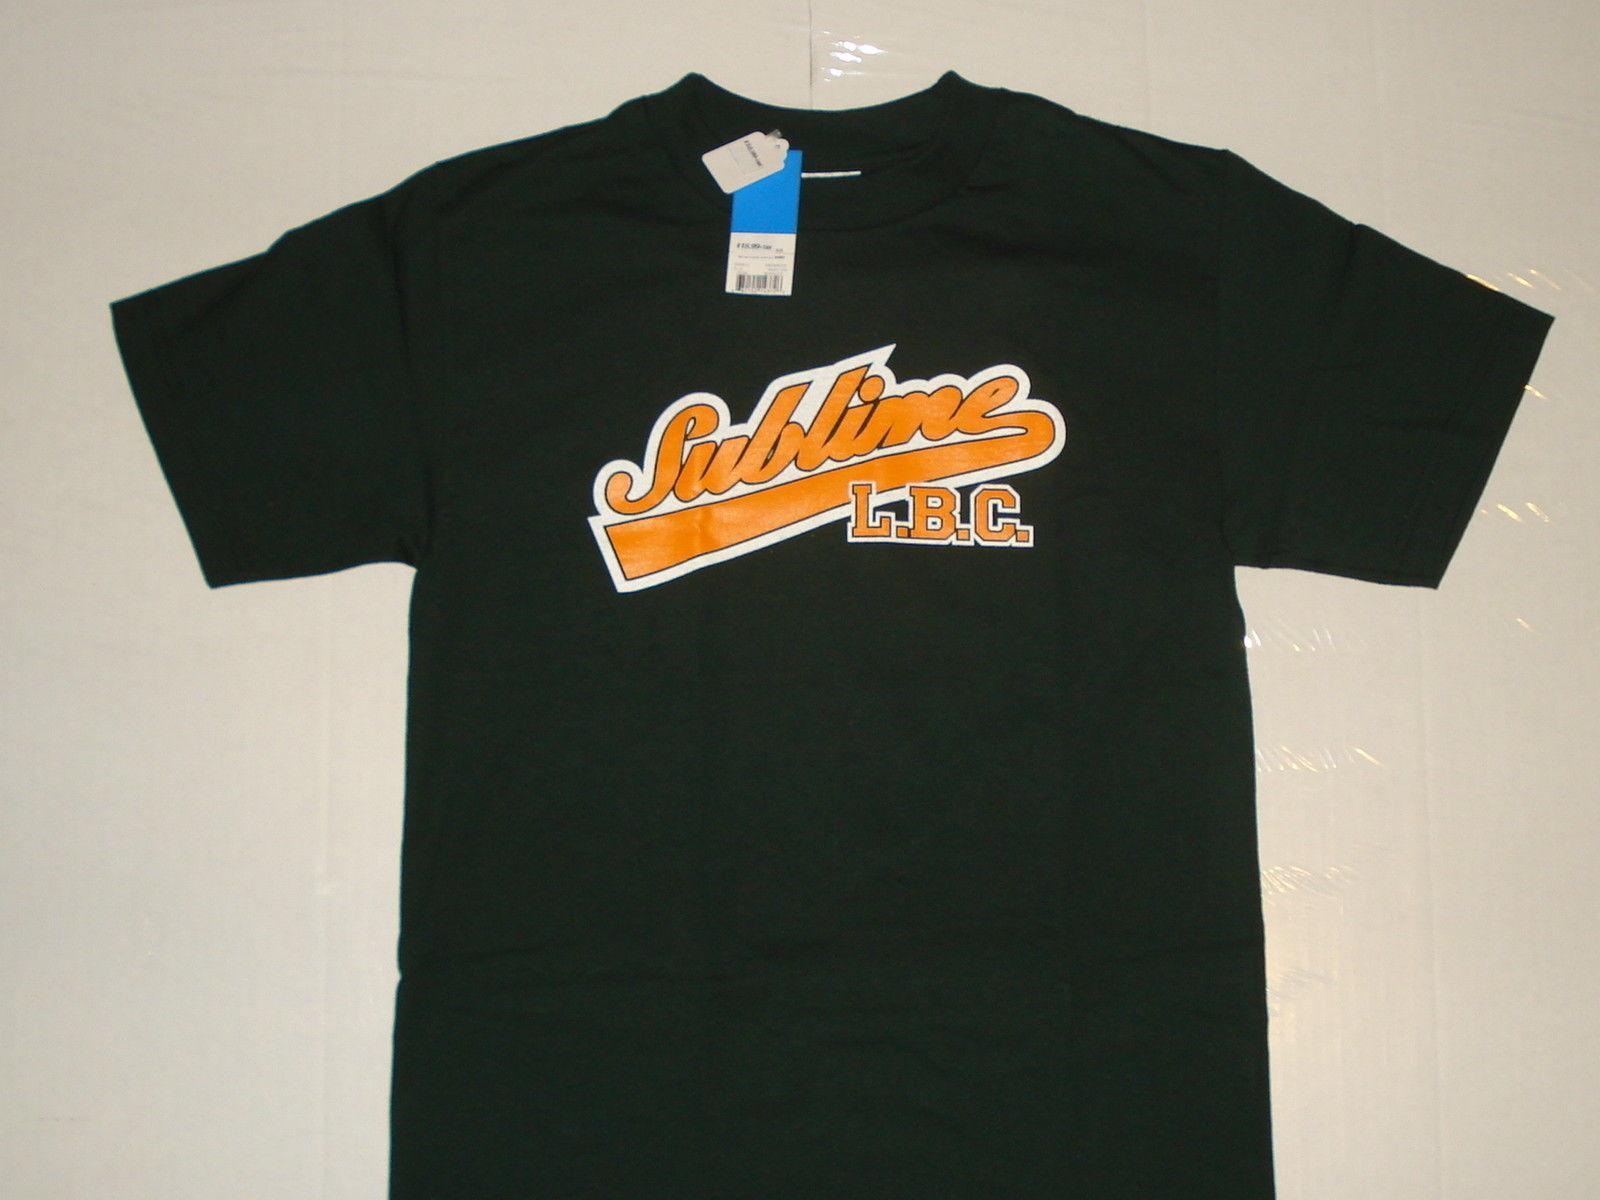 188636a9656 SUBLIME LBC GREEN RETRO NEW T SHIRT S M L XL 2XL PUNK ROCK SKA POP 40 Oz  BRADLEY Funny Unisex Casual Tshirt Top Denim Shirts Design T Shirts From ...